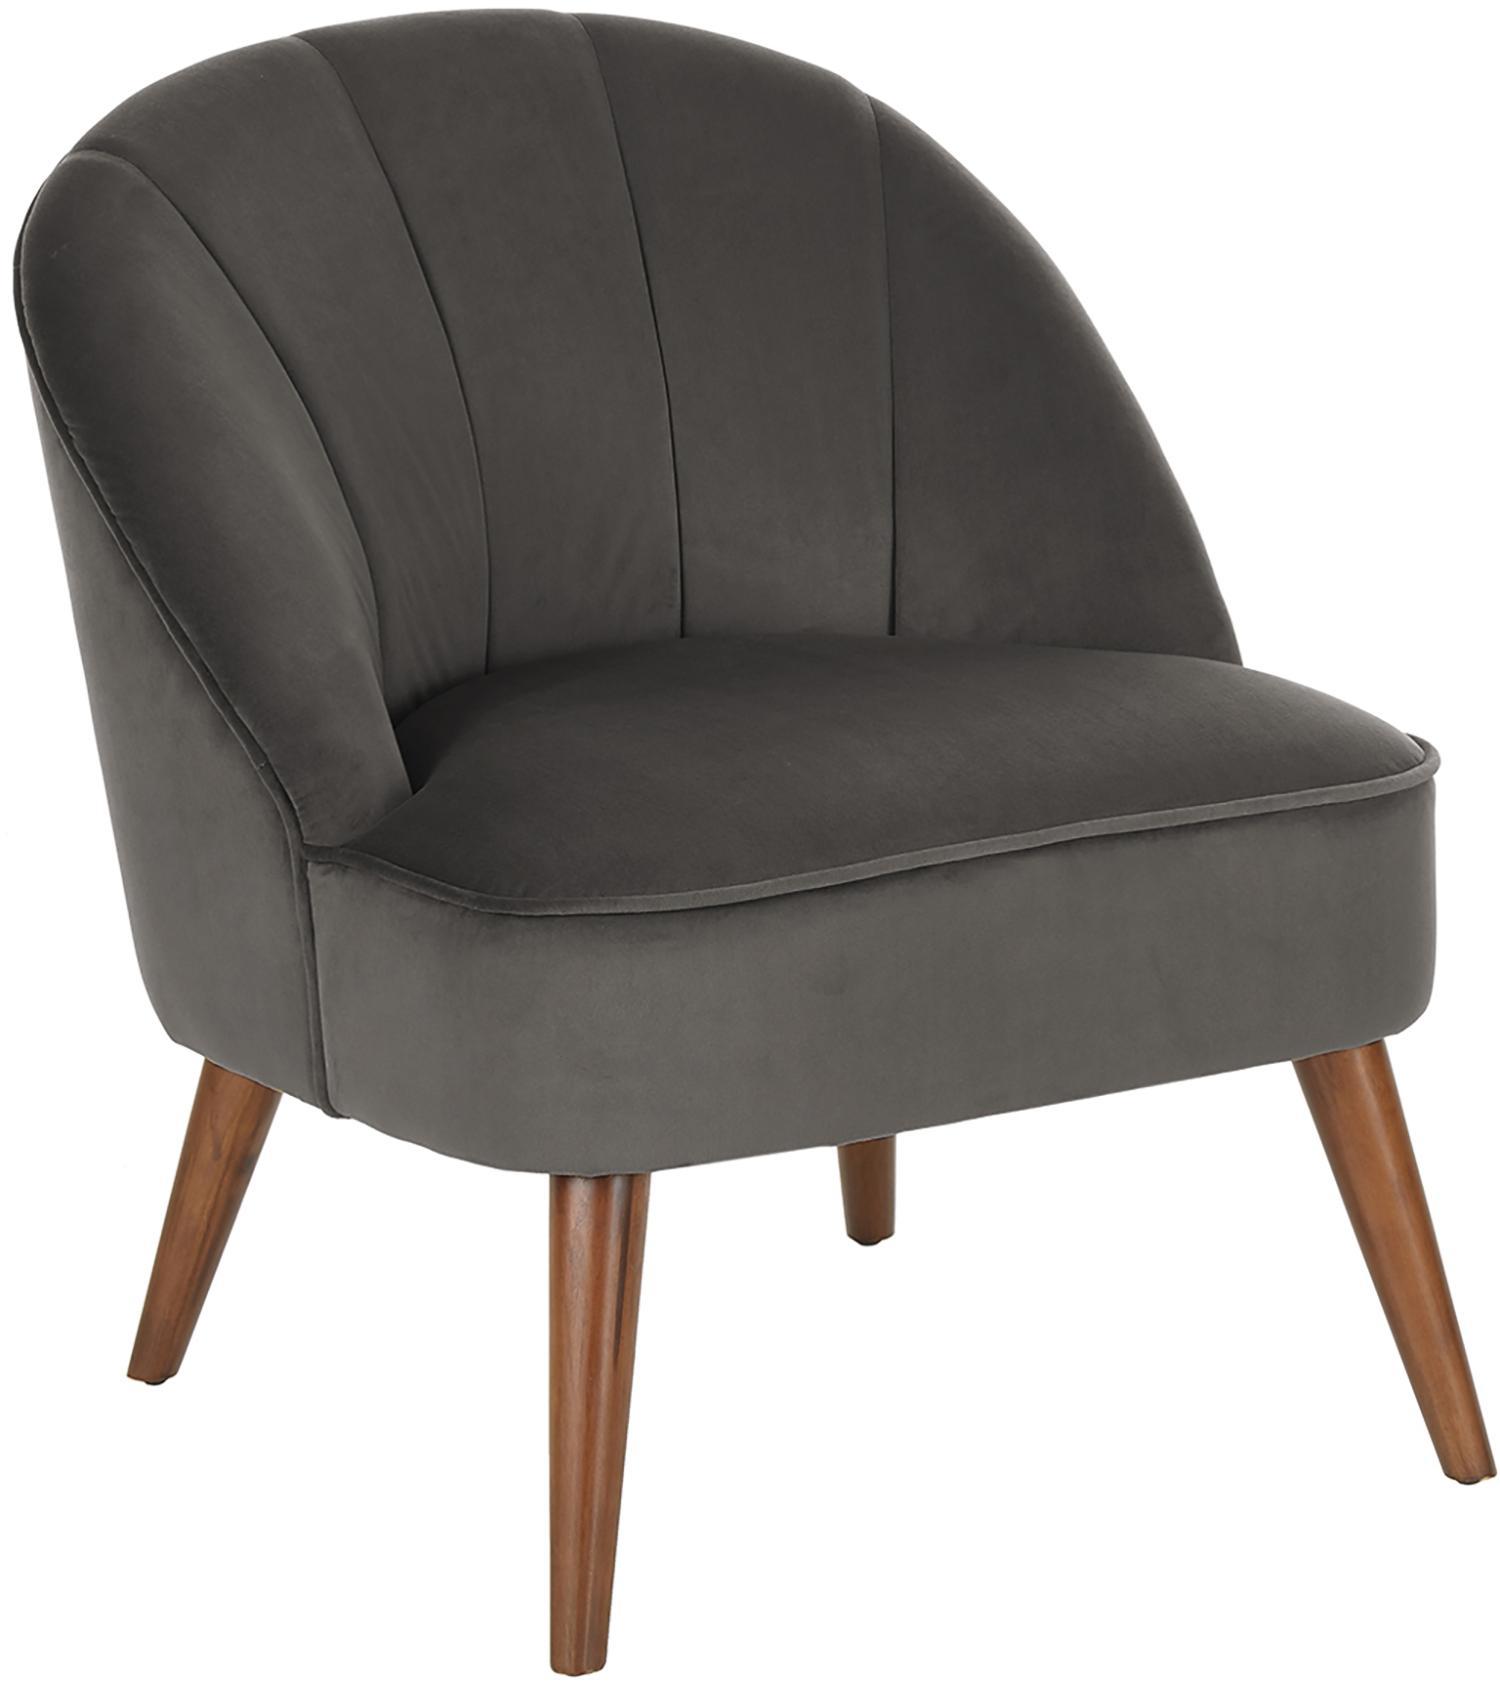 Fluwelen fauteuil Aya, Bekleding: fluweel (polyester), Poten: berkenhout, gelakt, Fluweel donkergrijs, B 73 x D 64 cm